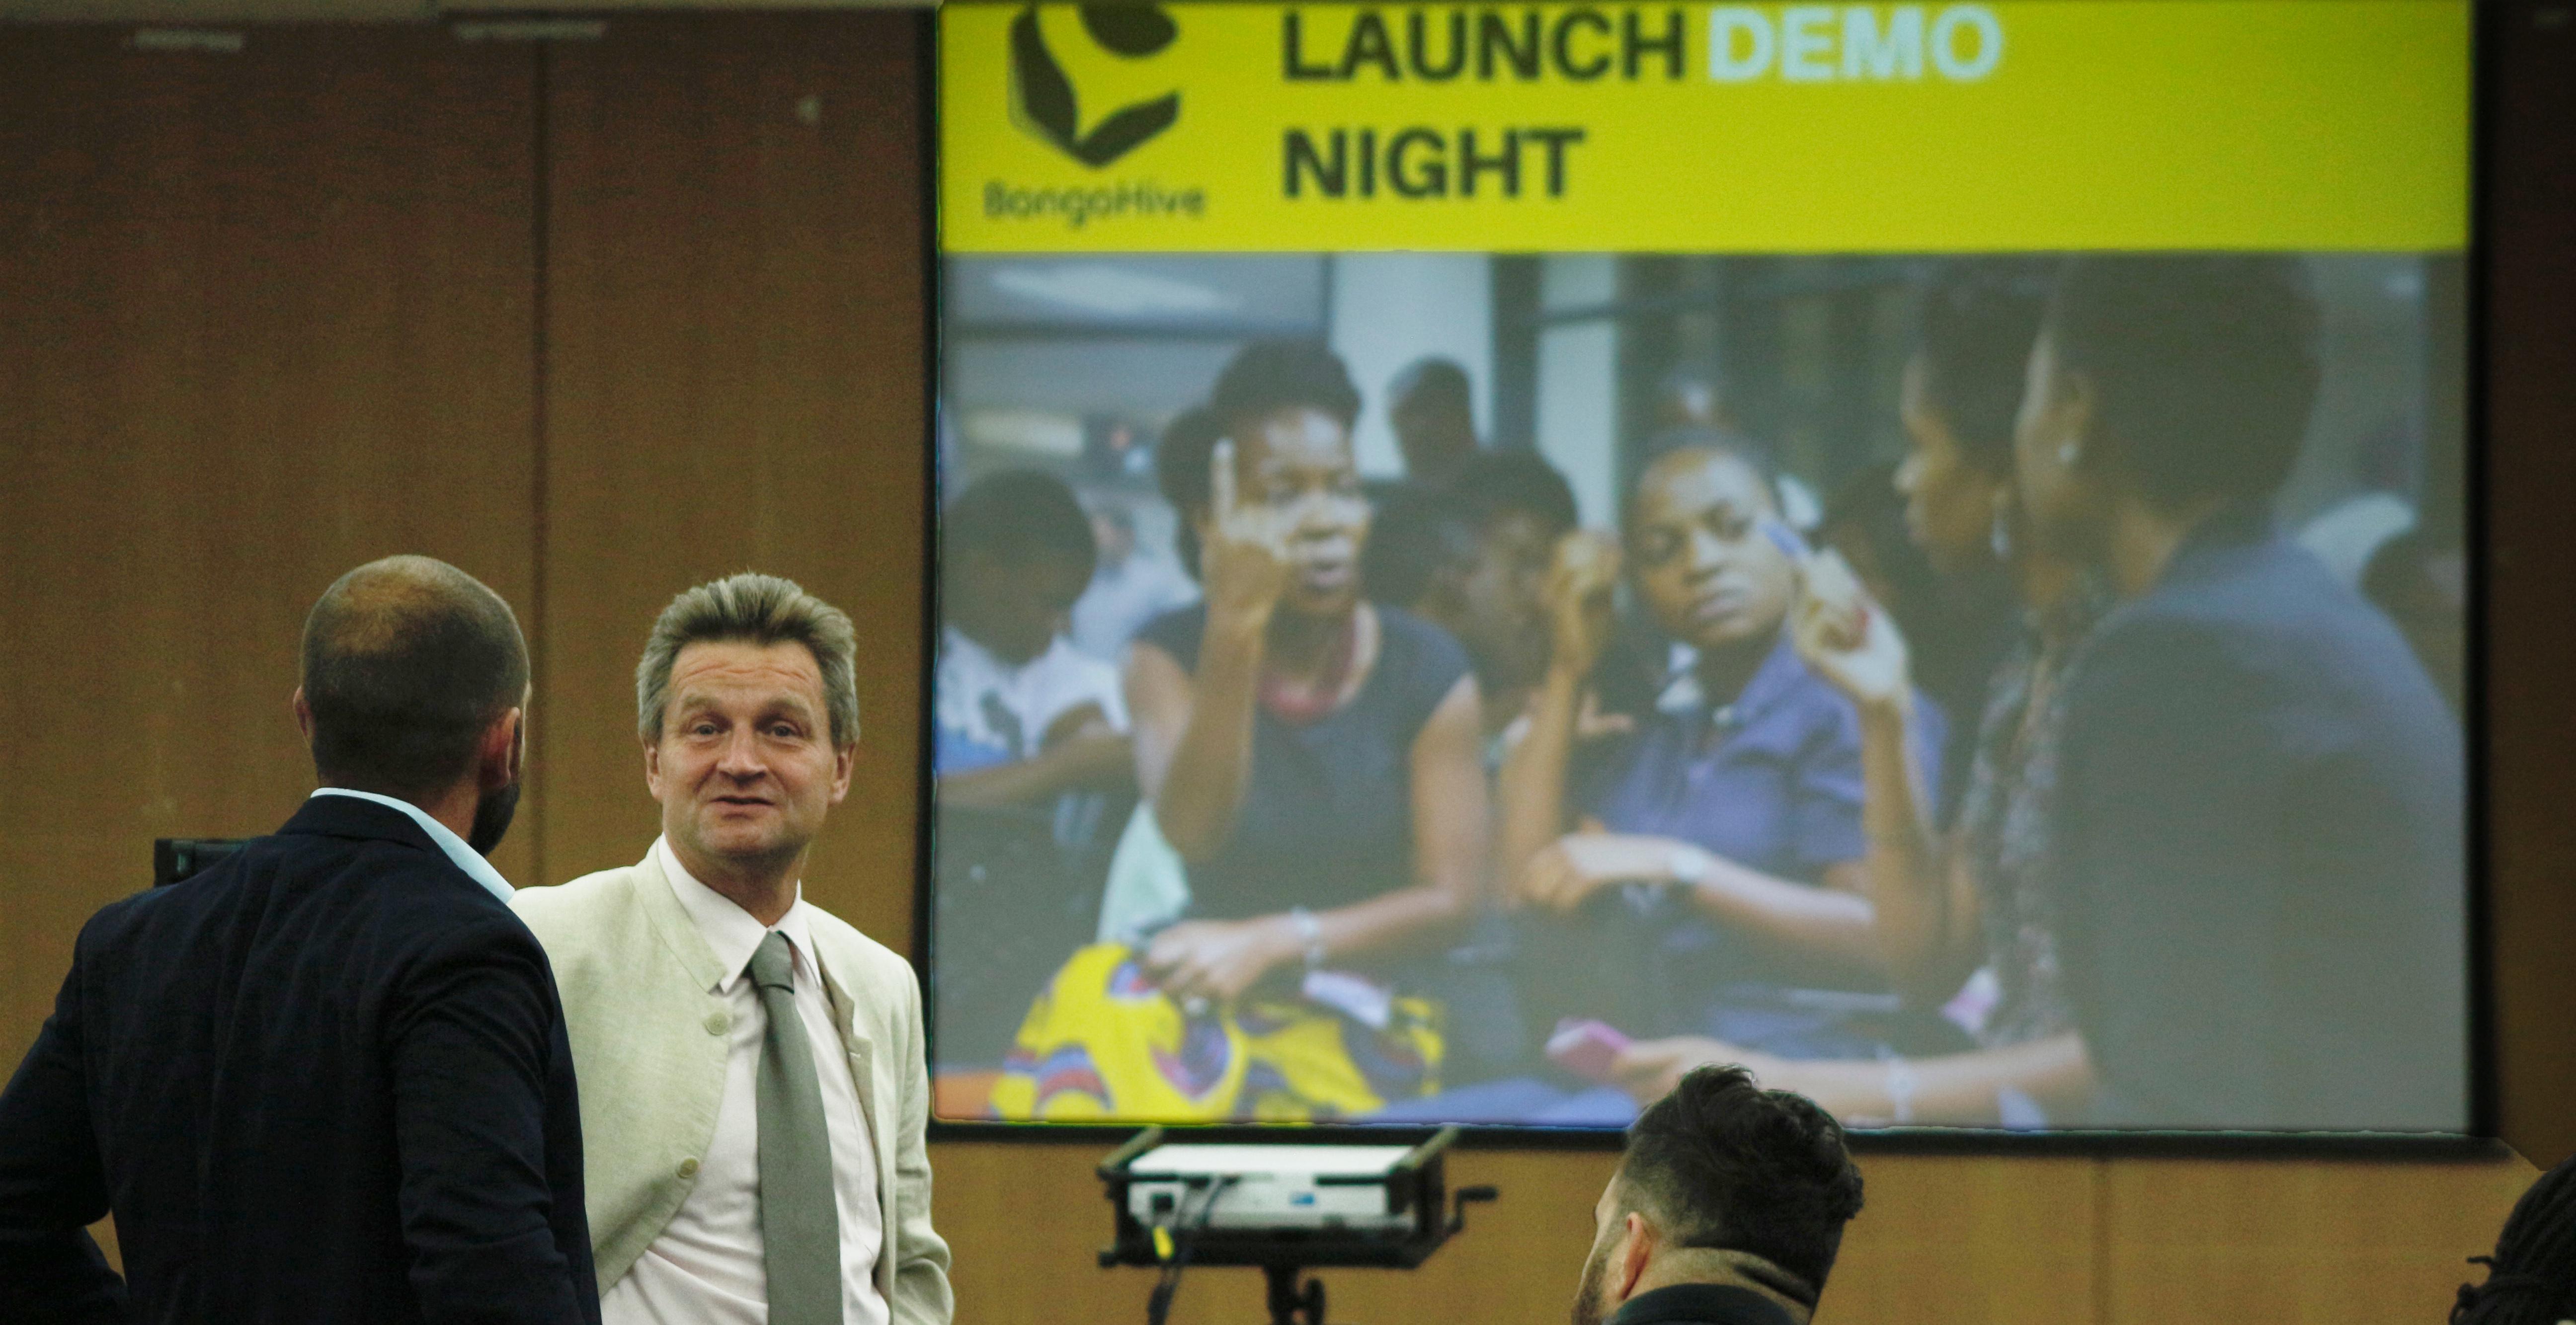 launch startup program